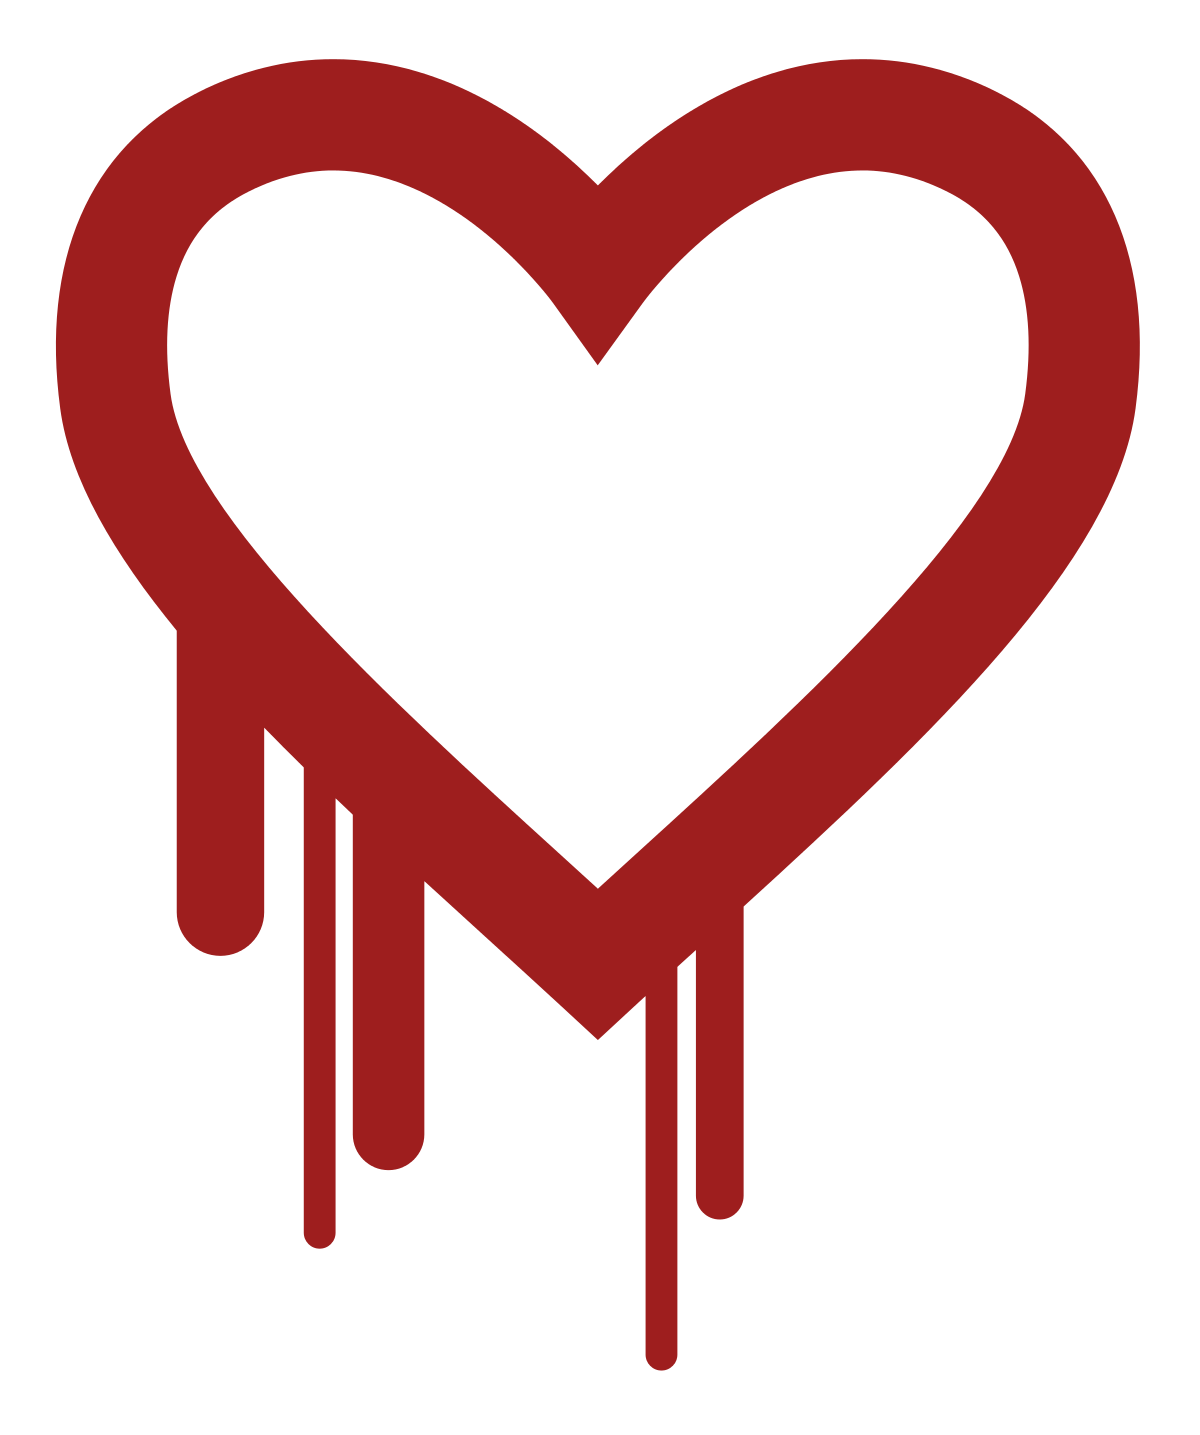 Heartbeat clipart heart beating fast. Heartbleed wikipedia